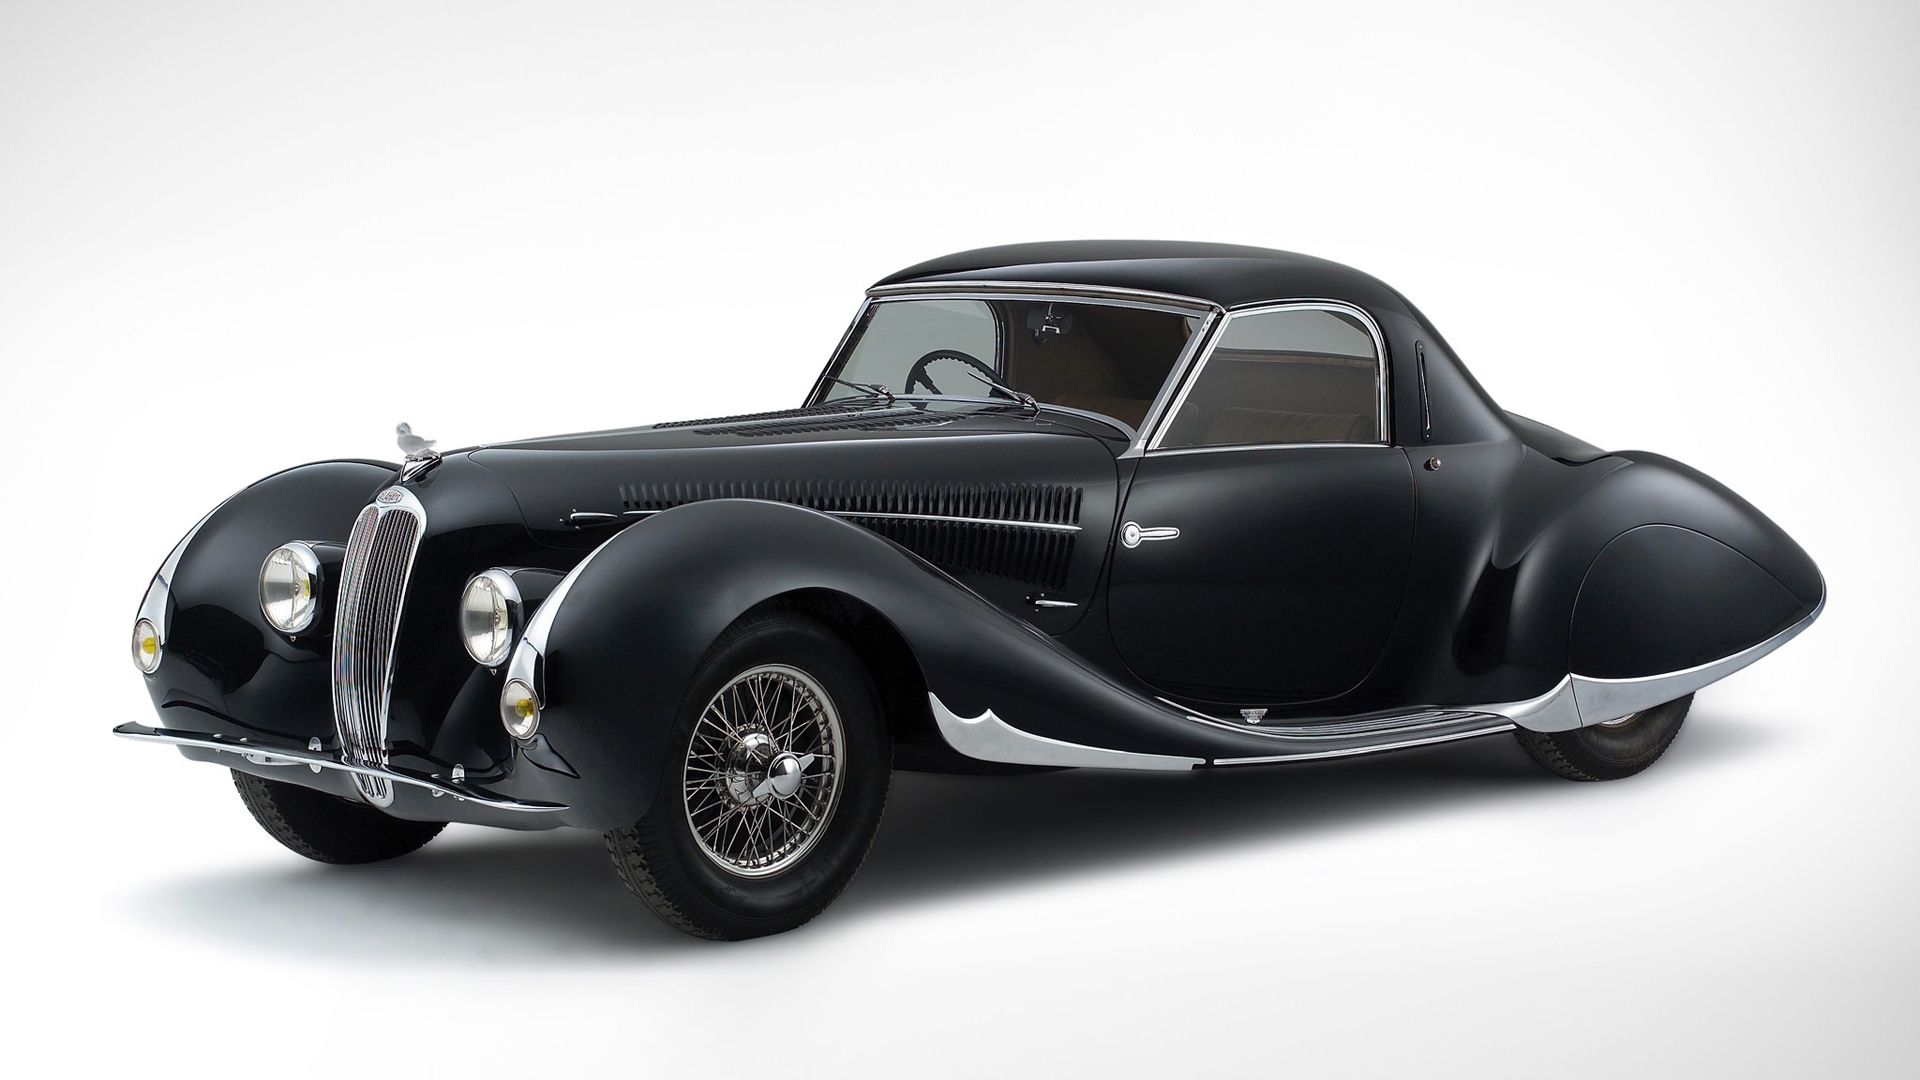 Beautiful black vintage car. | Ruitertassen Black | Pinterest